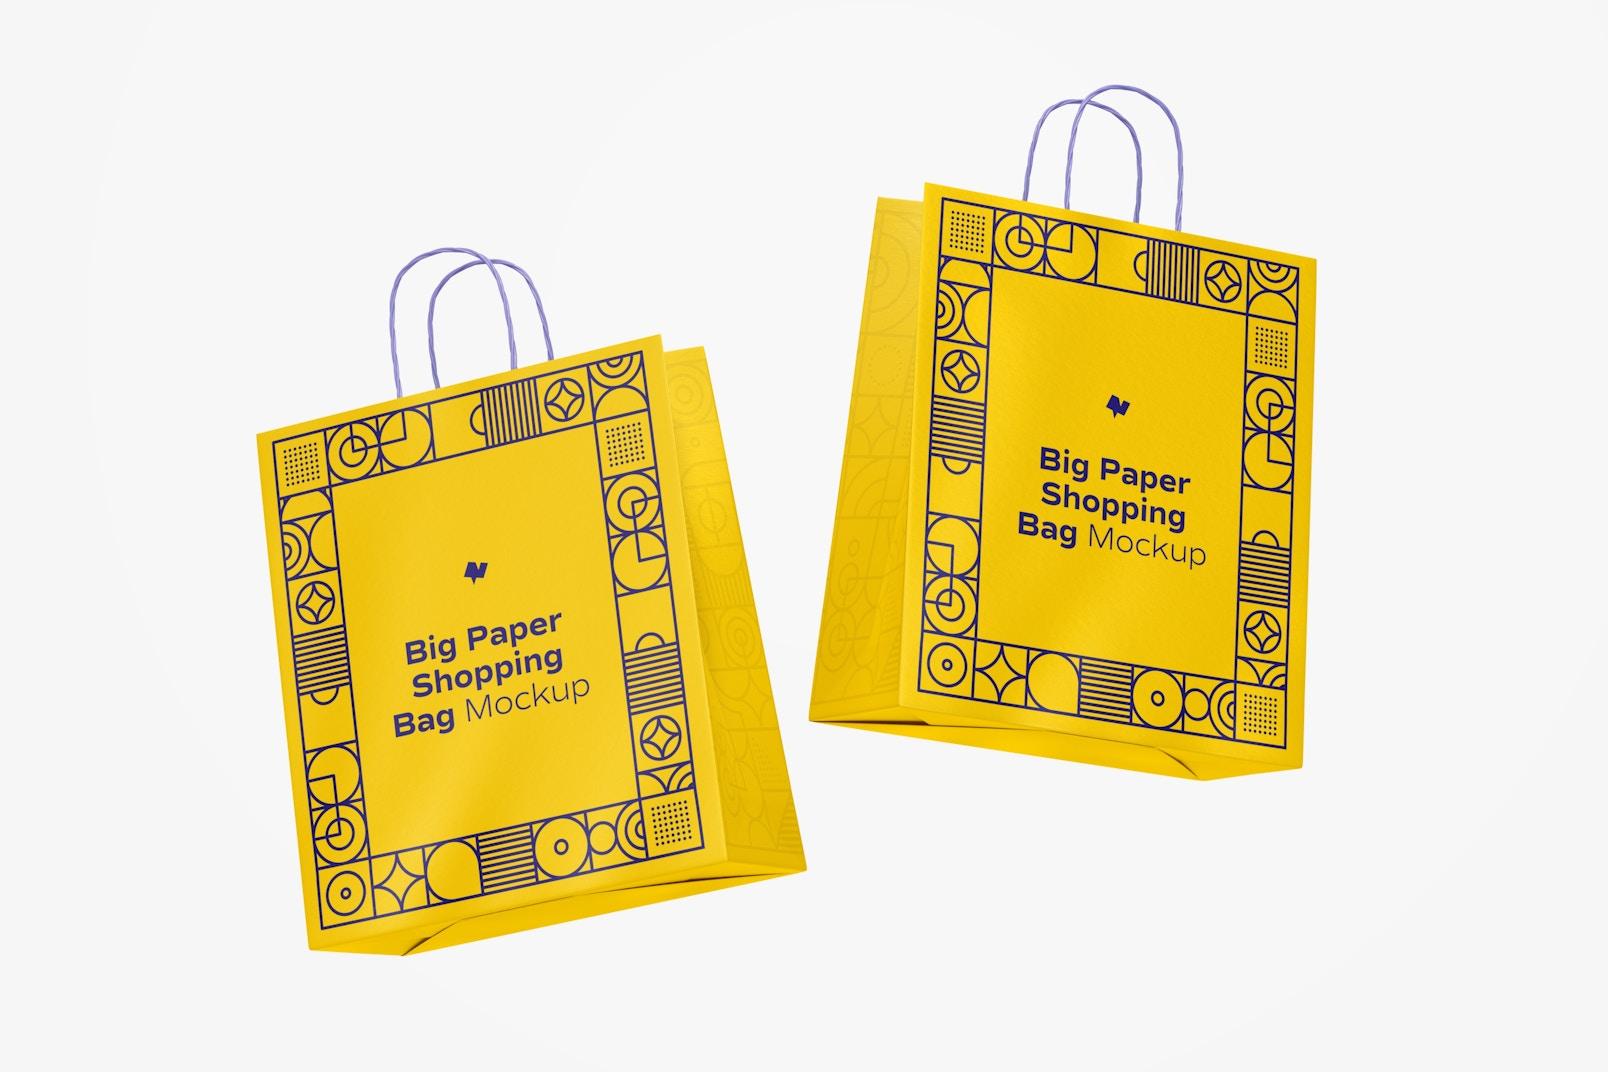 Big Paper Shopping Bags Mockup, Floating